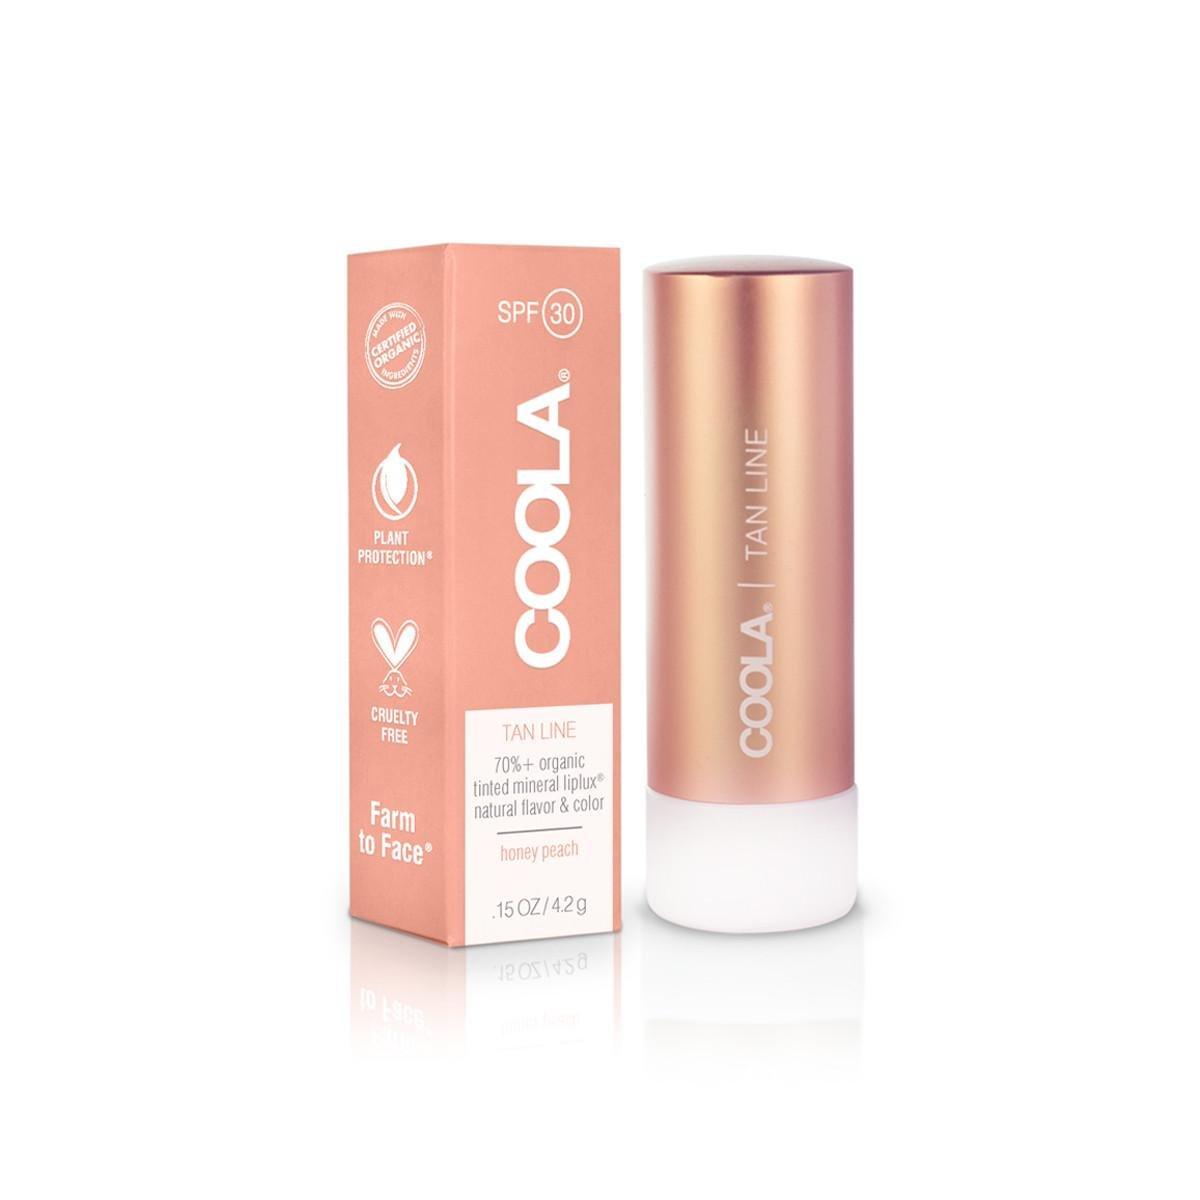 COOLA Mineral Liplux Tan Line Lip Balm SPF 30 4.2g 314 036